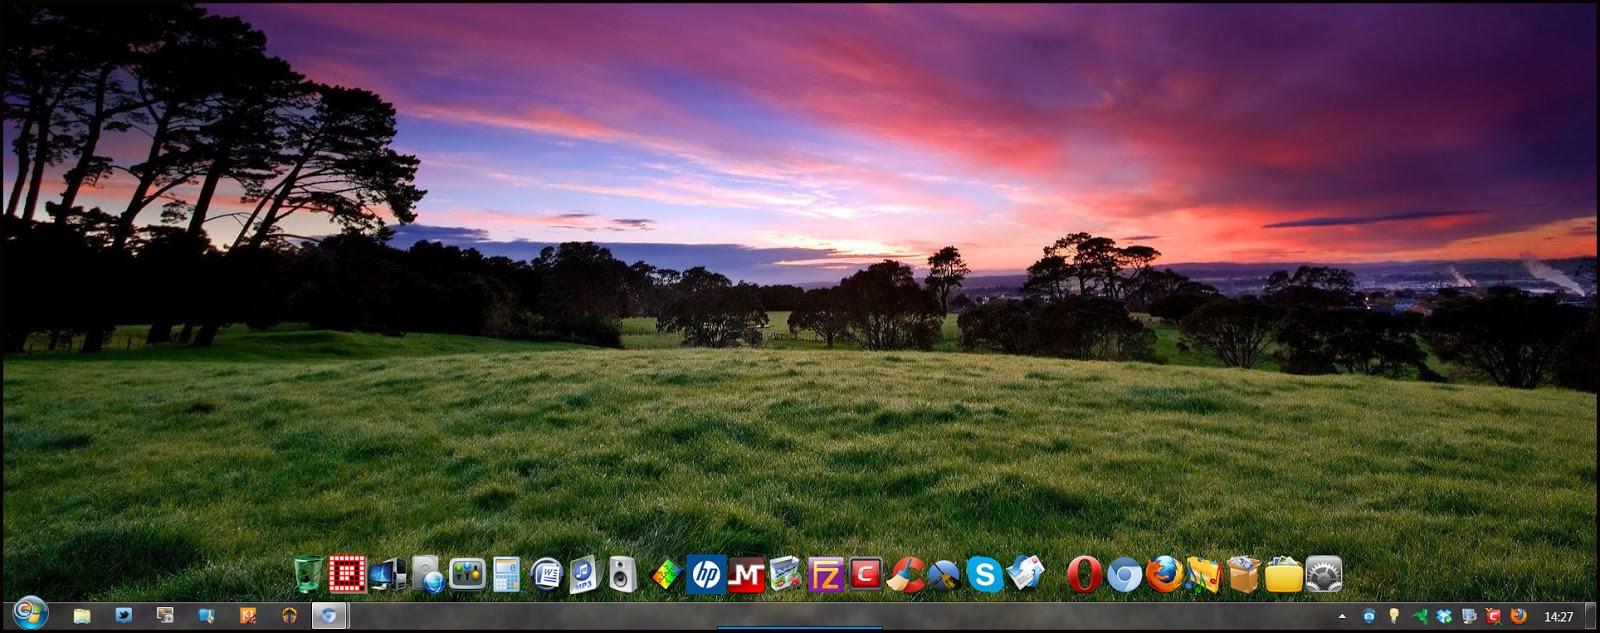 RocketDock, free and safe download. RocketDock latest version: Highly  customizable Mac-style navigation bar for your desktop. ... RocketDock for  Windows...